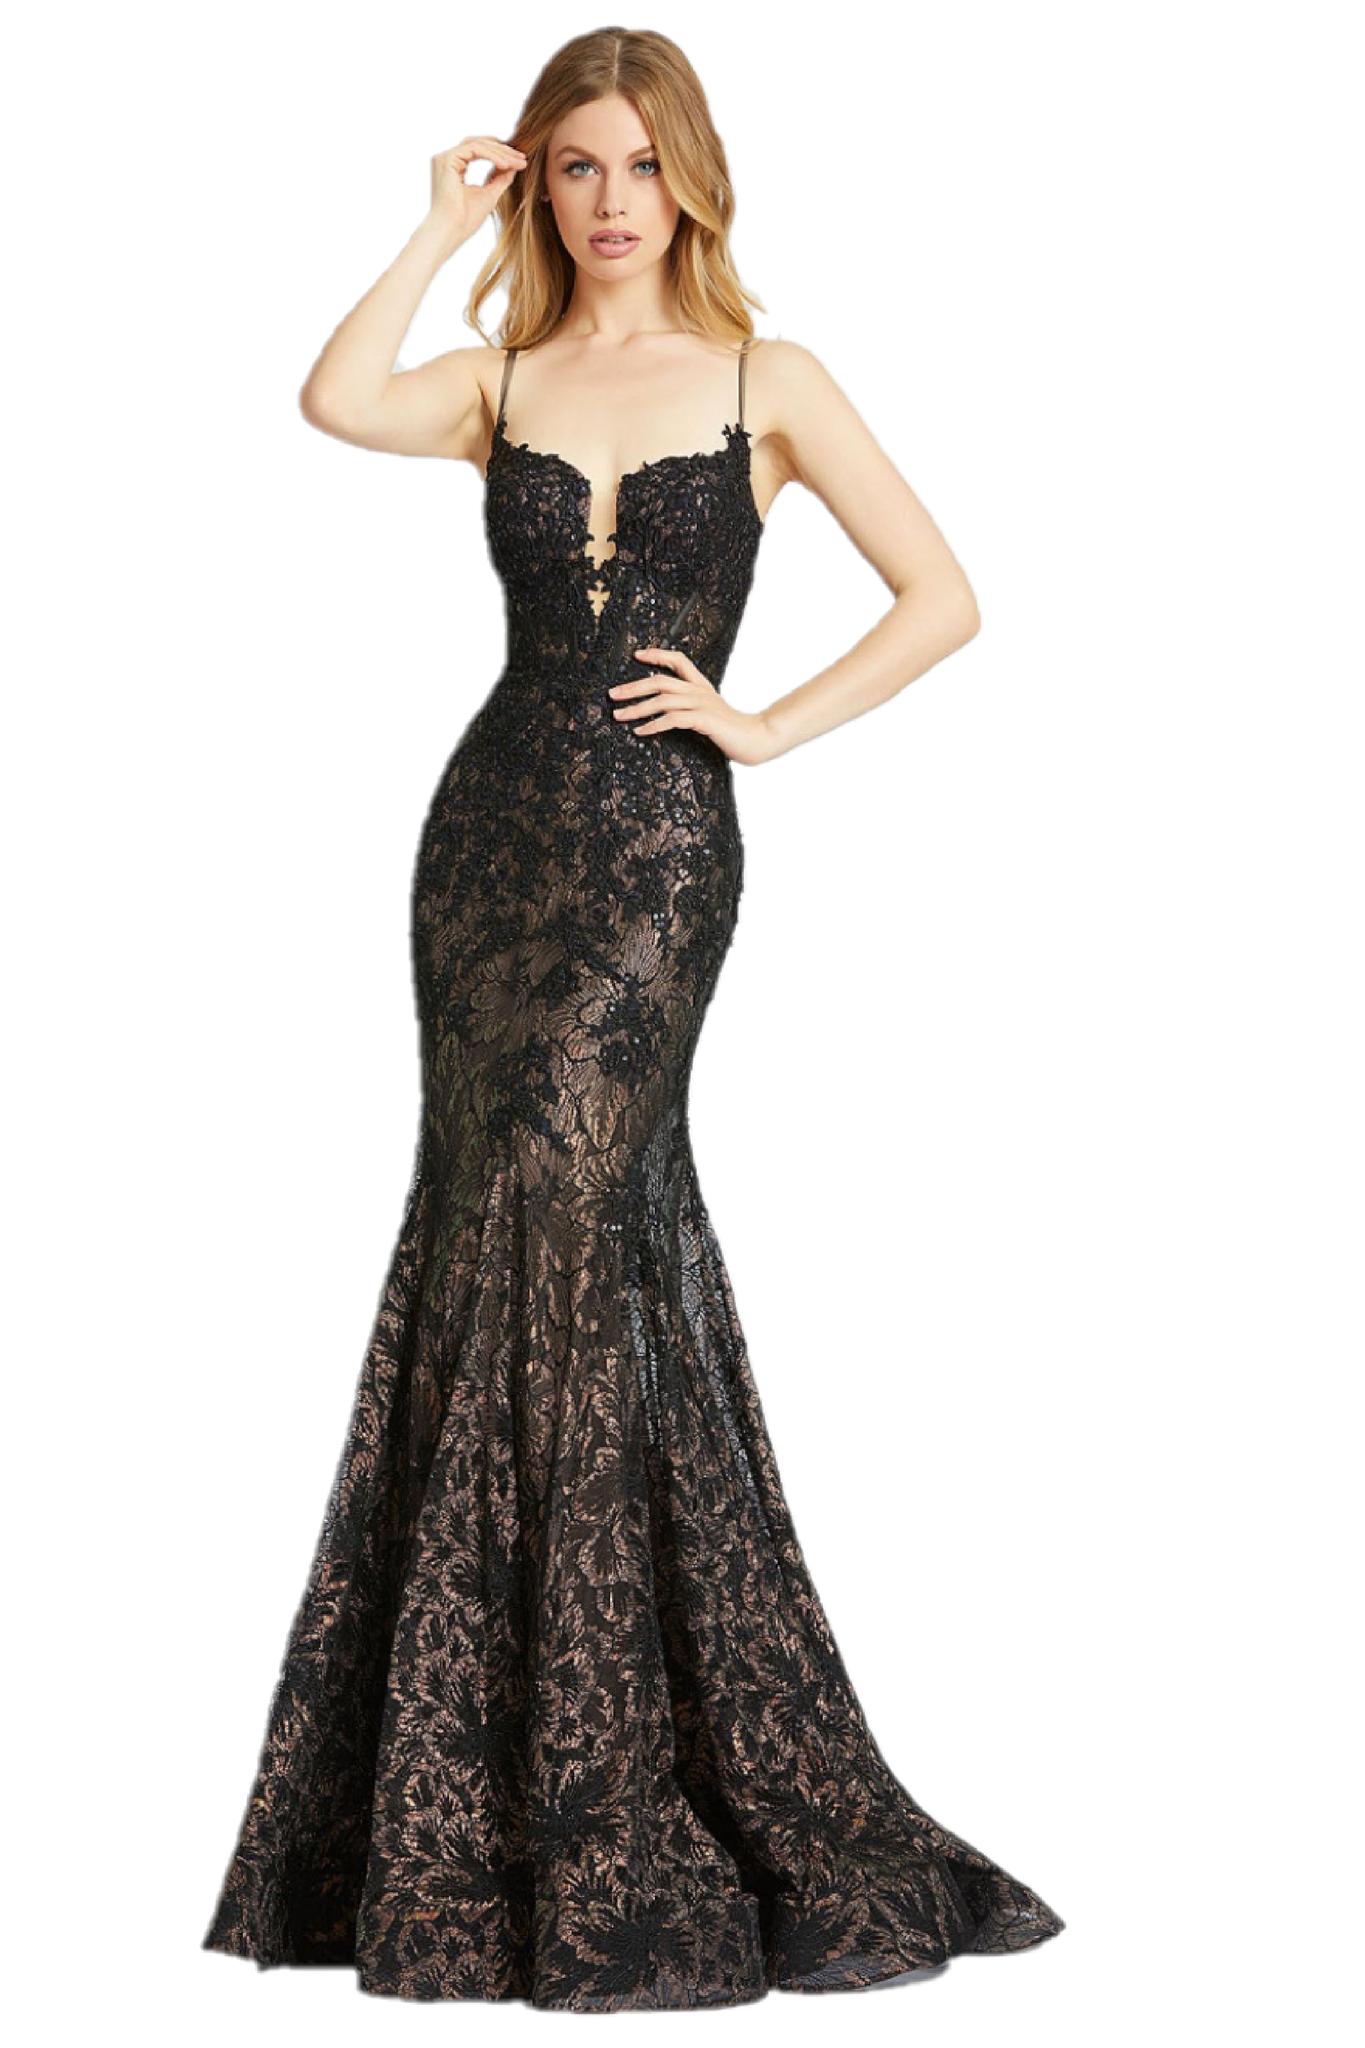 Mac Duggal 79252m Metallic Lace Sheer Corset Mermaid Prom Dress Pageant Gown In 2021 Mermaid Prom Dresses Mac Duggal Dresses Mac Duggal Prom [ 2048 x 1365 Pixel ]